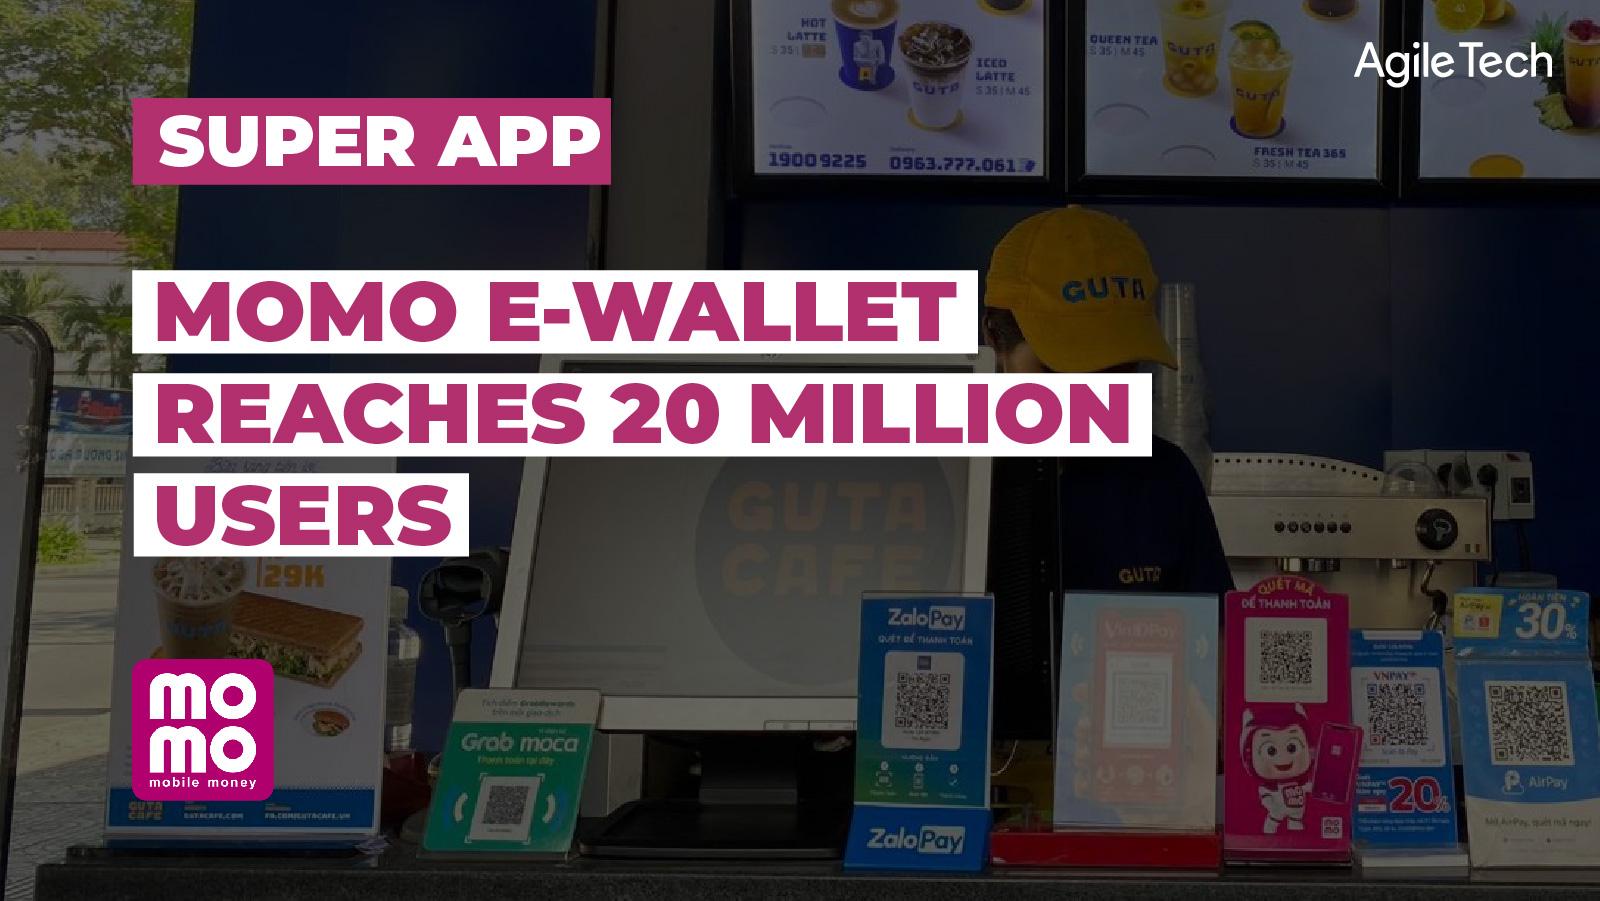 momo wallet, digital payment in vietnam, momo super app reaches 20 million users